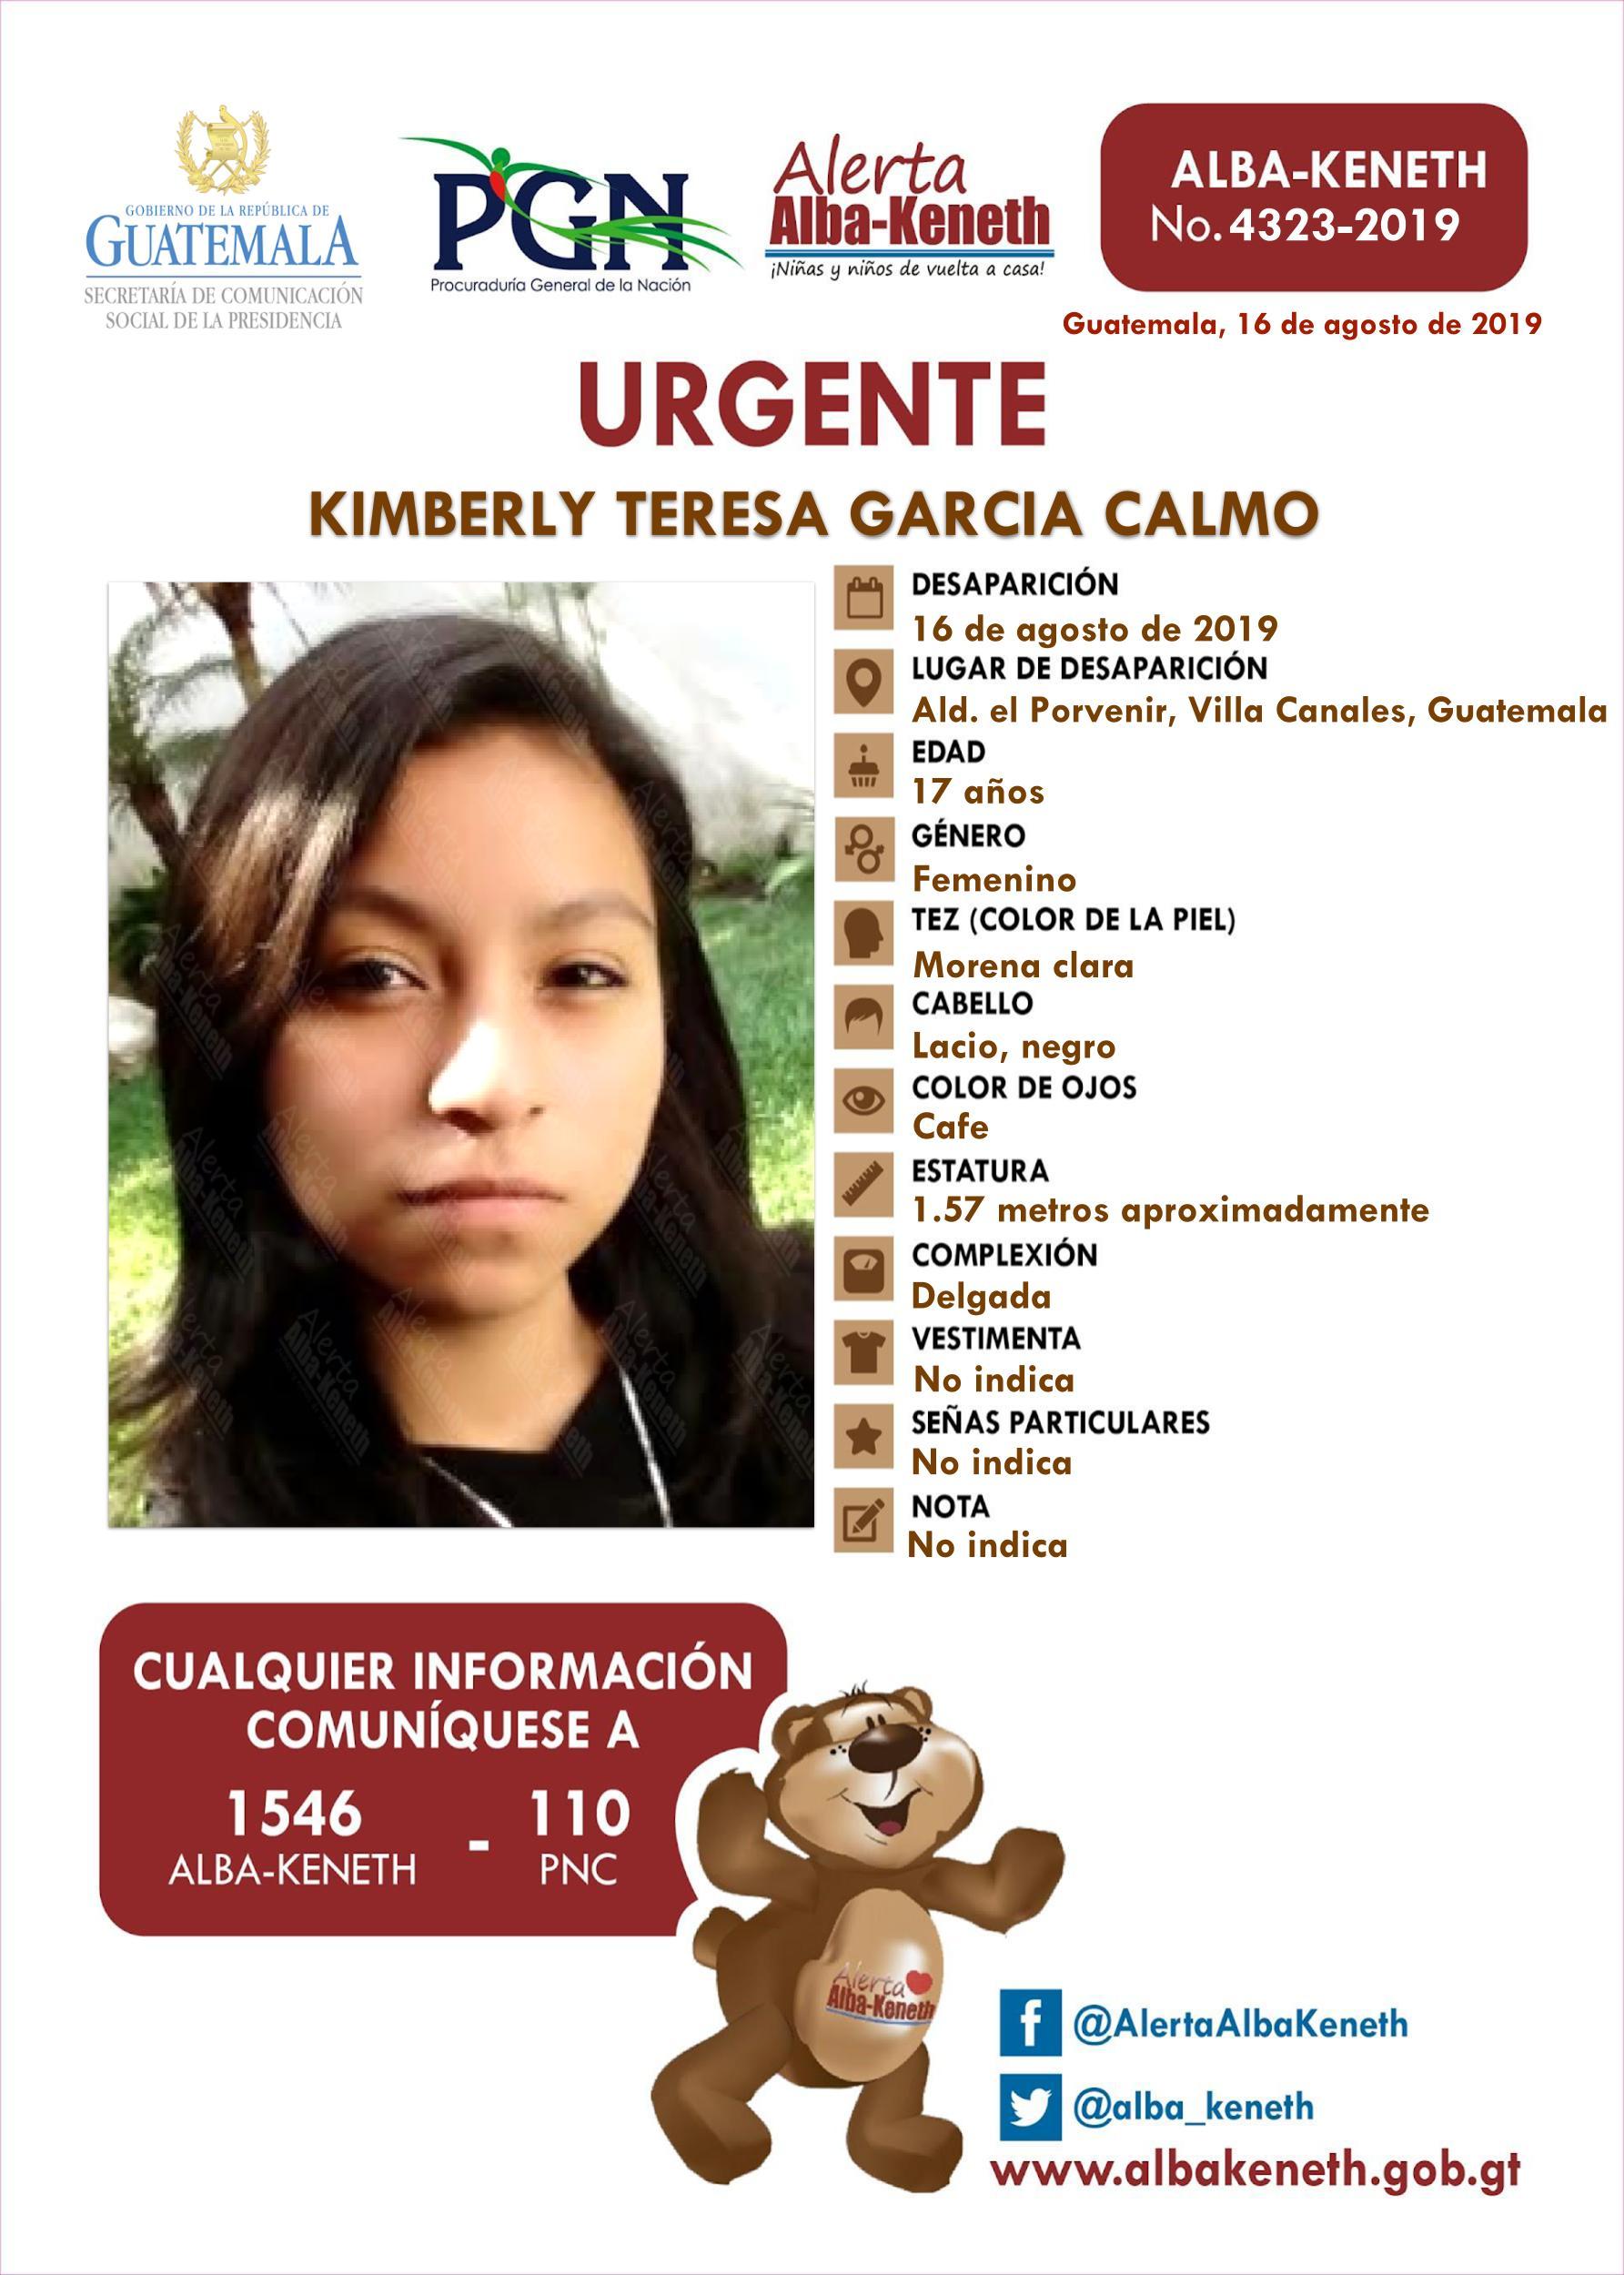 Kimberly Teresa Garcia Calmo